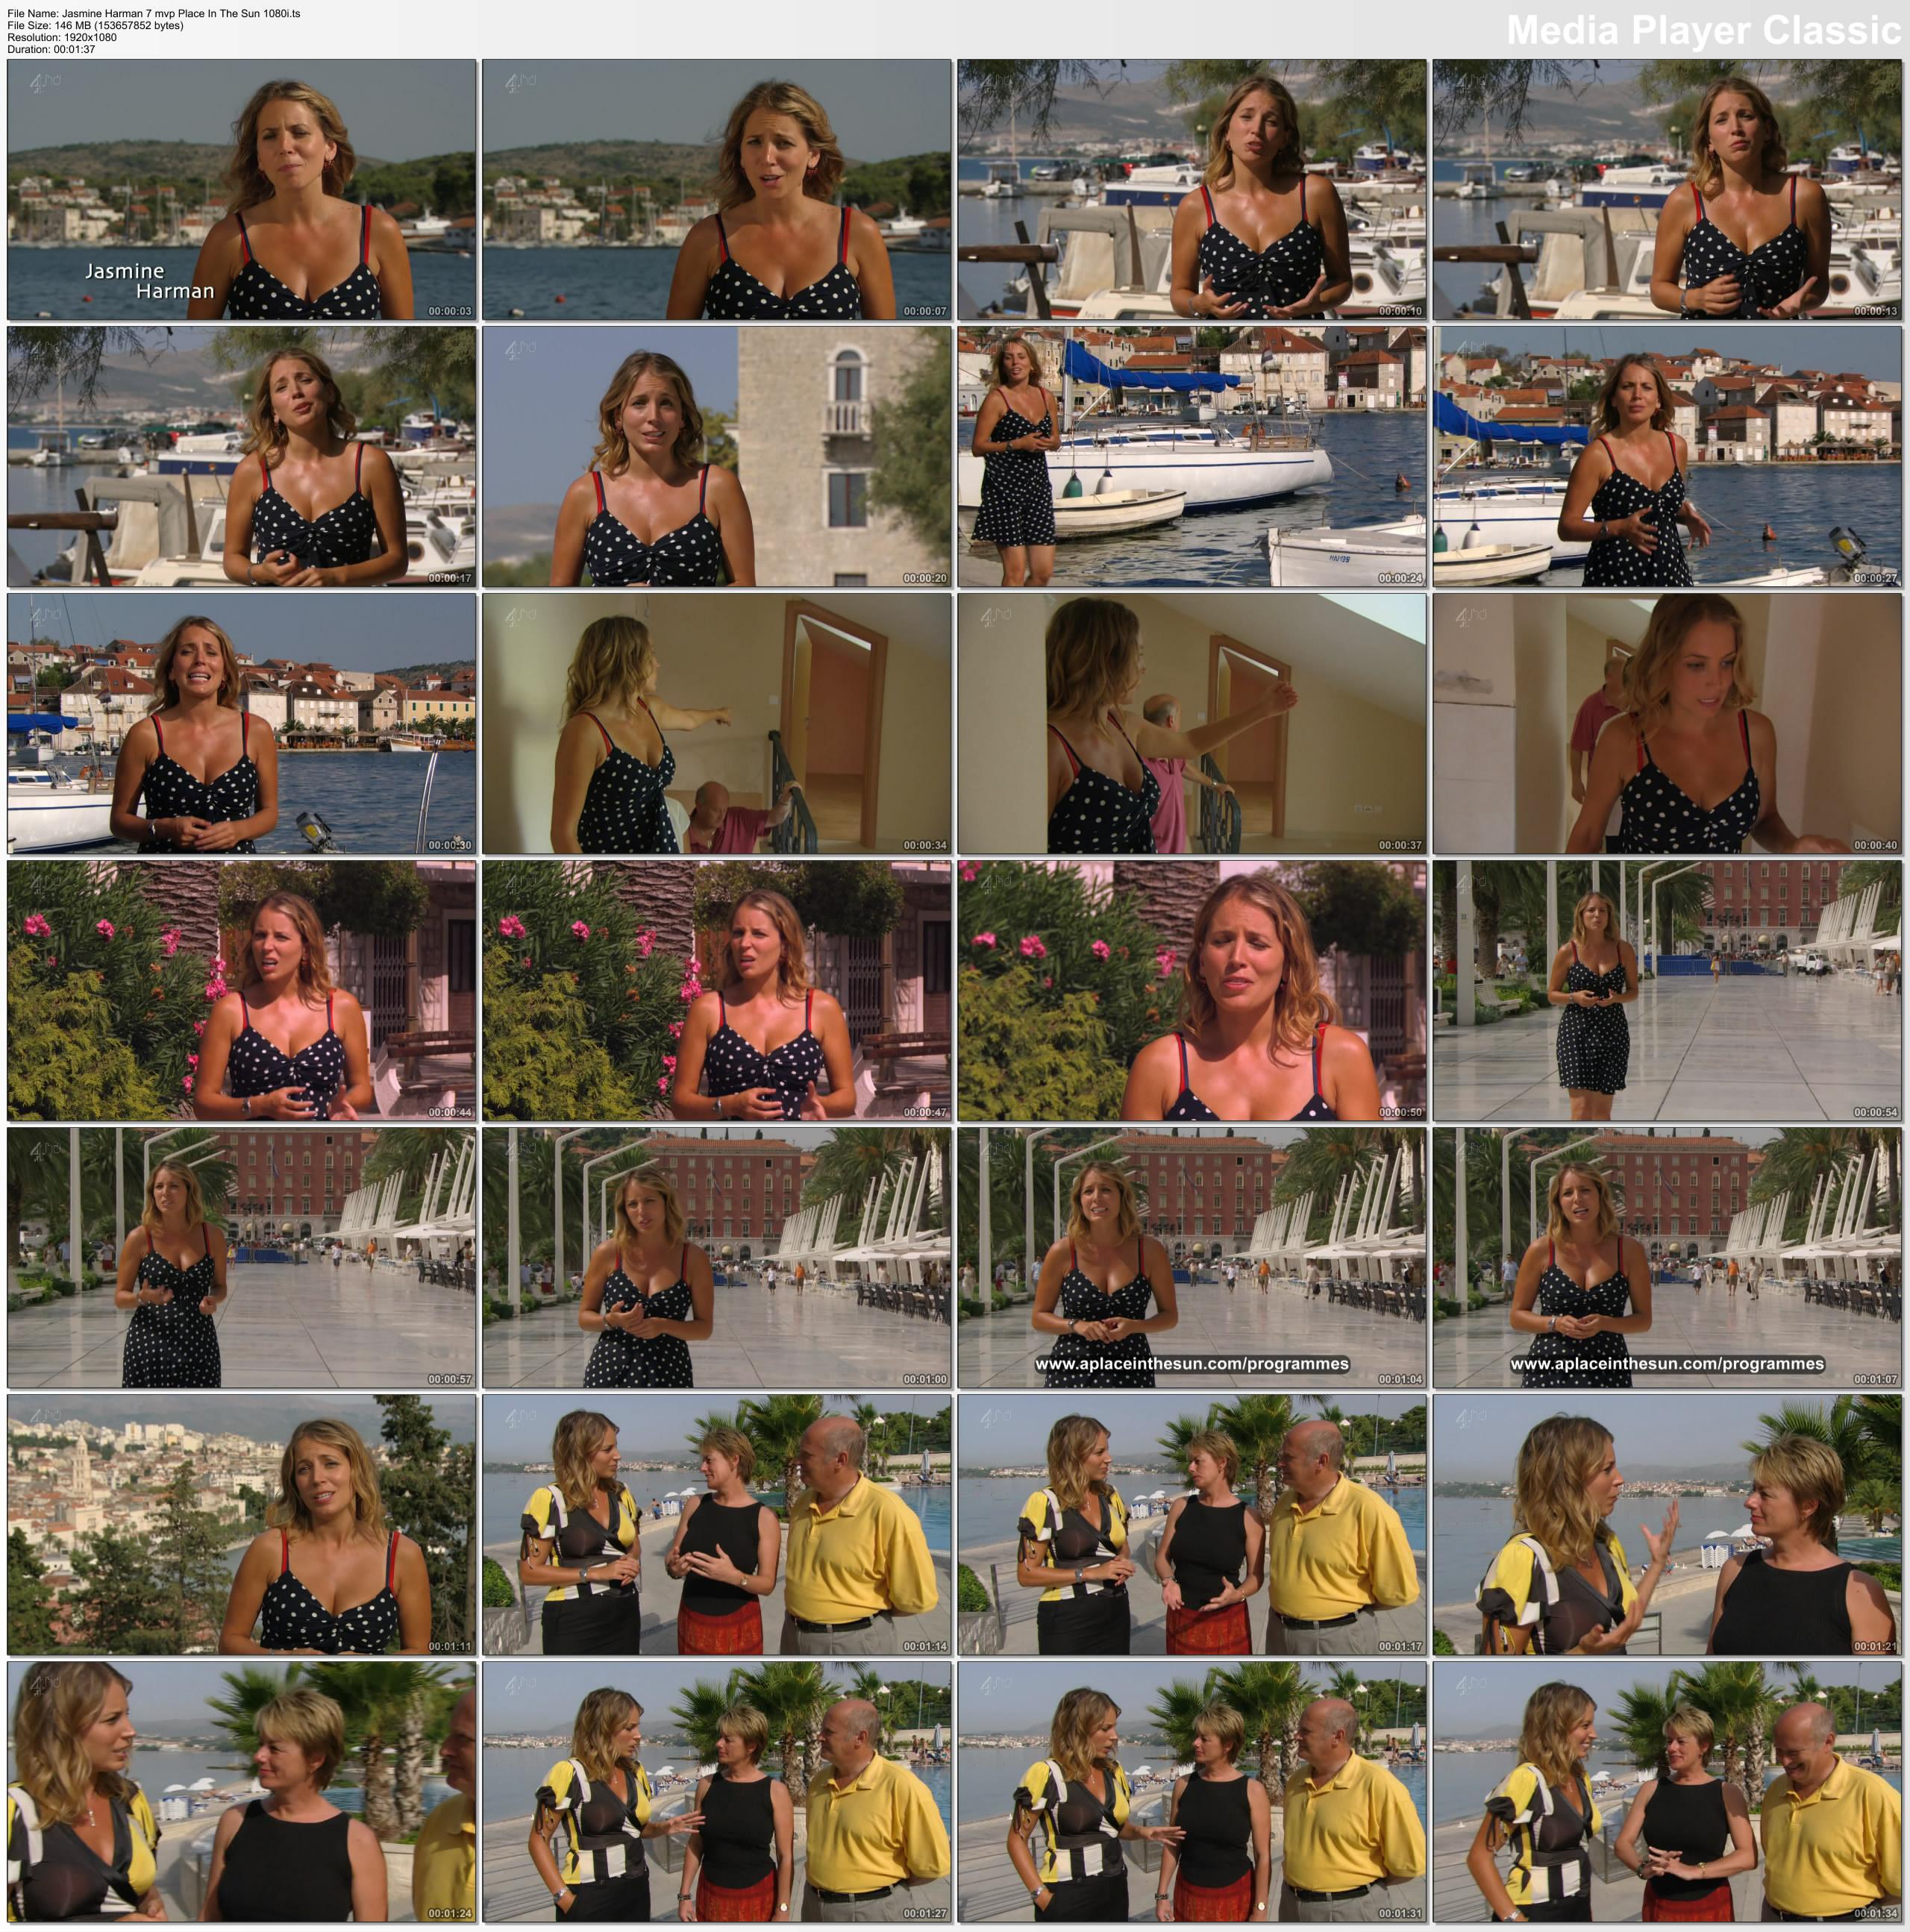 Jasmine Harman 7 mvp Place In The Sun 1080i.ts_thumbs.jpg